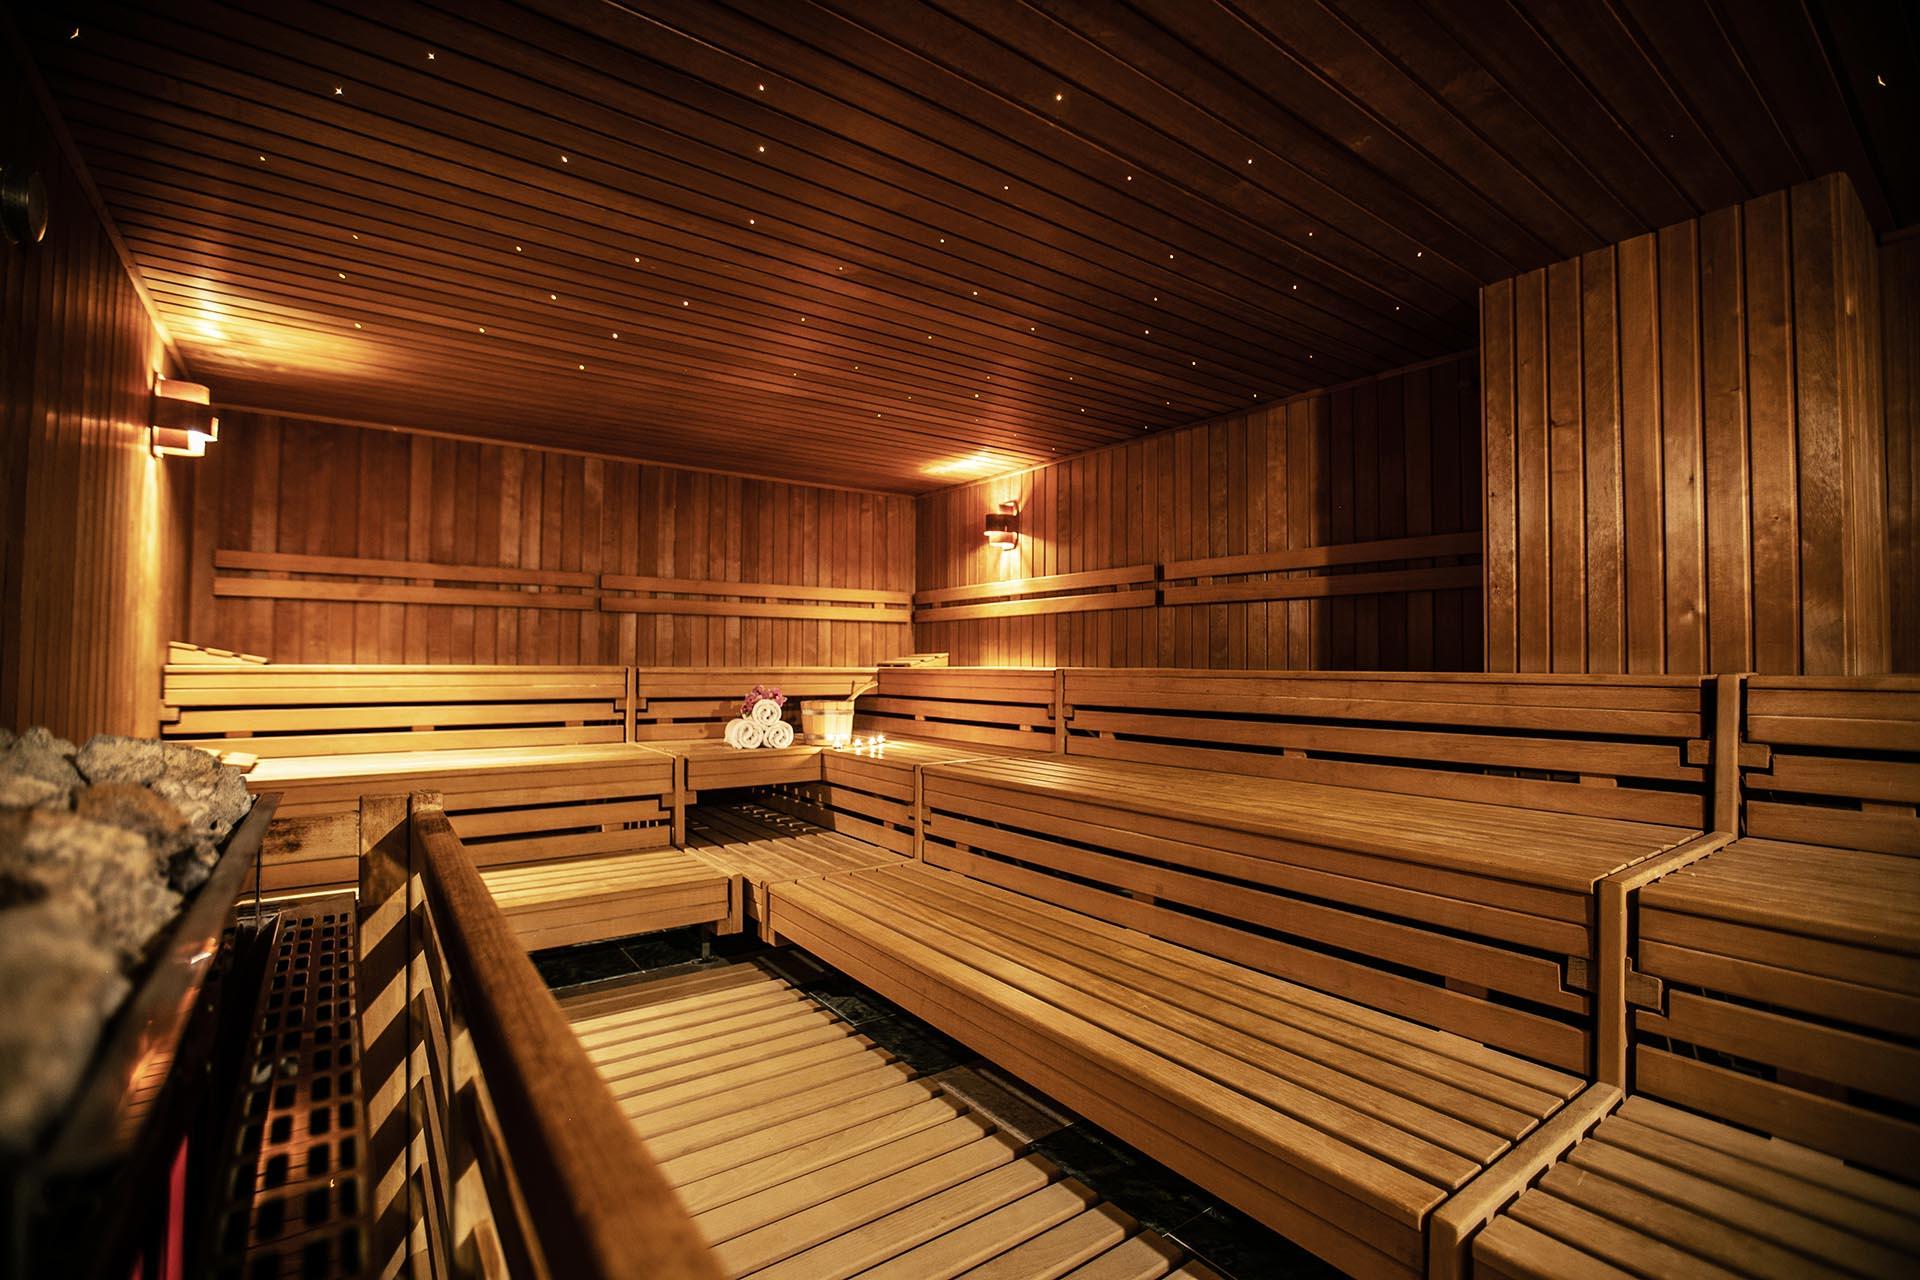 Amadria-SIBENIK-LKIB-Ivan-LR-047-Wellness&Spa-Sauna